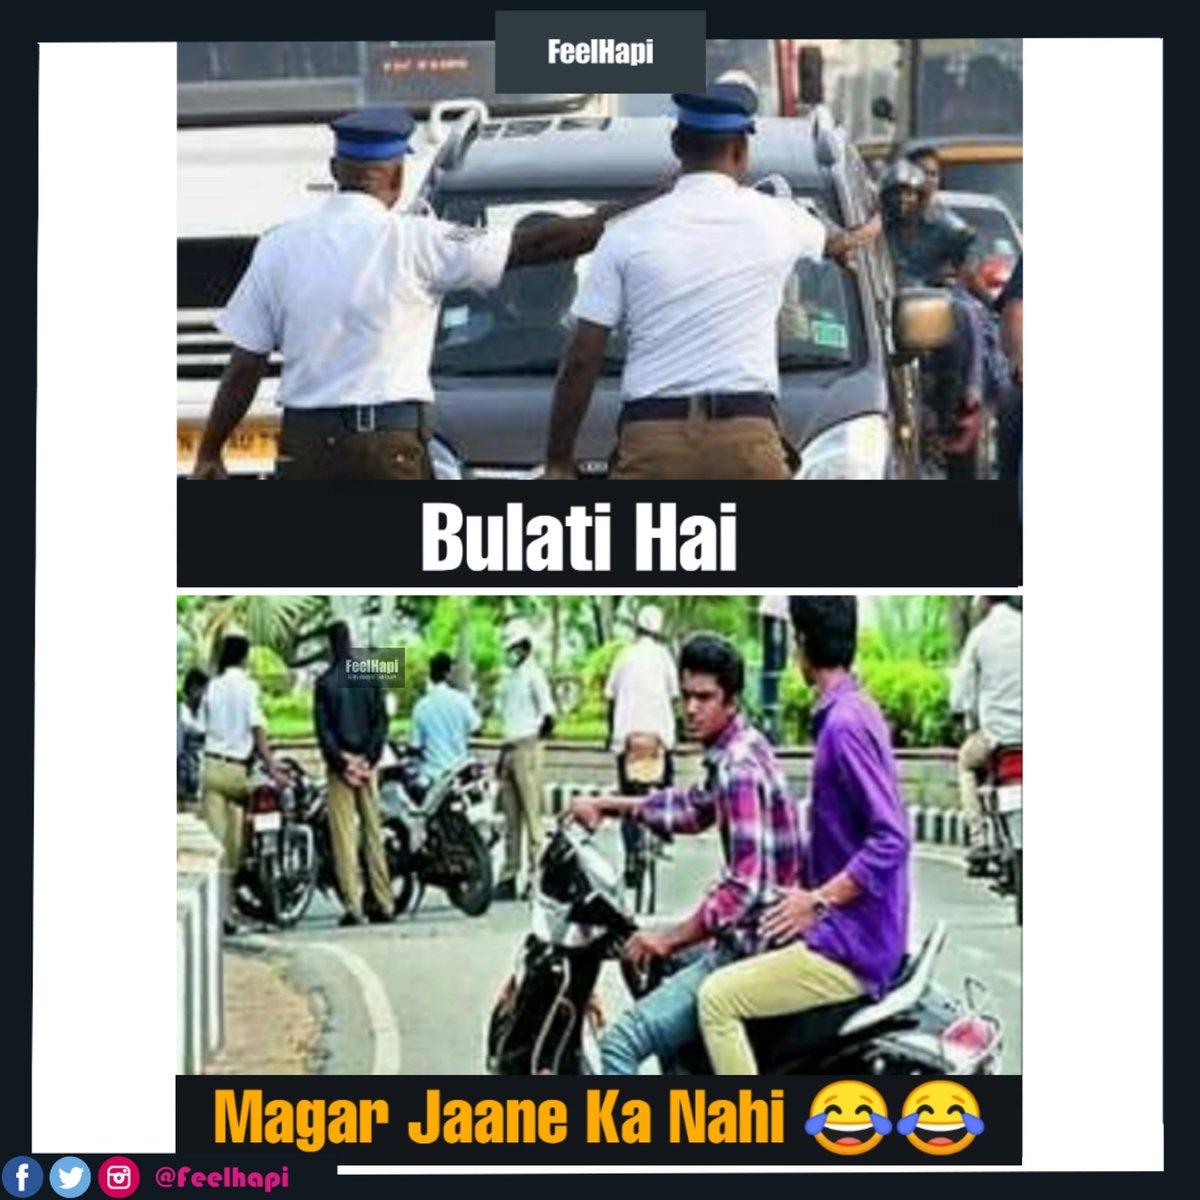 Jaane Ka Nahi  . . #feelhapi #trafficpolice #traffic #unbelievable #talent #deserve #tomandjerrymemes #tomandjerry #tom #jarry #dance #follow #like #rap #photography #talented #singing #fashion #entertainment #viral #trafficpolice #police #roadsafety #trafficpic.twitter.com/nYTJe4CcAe